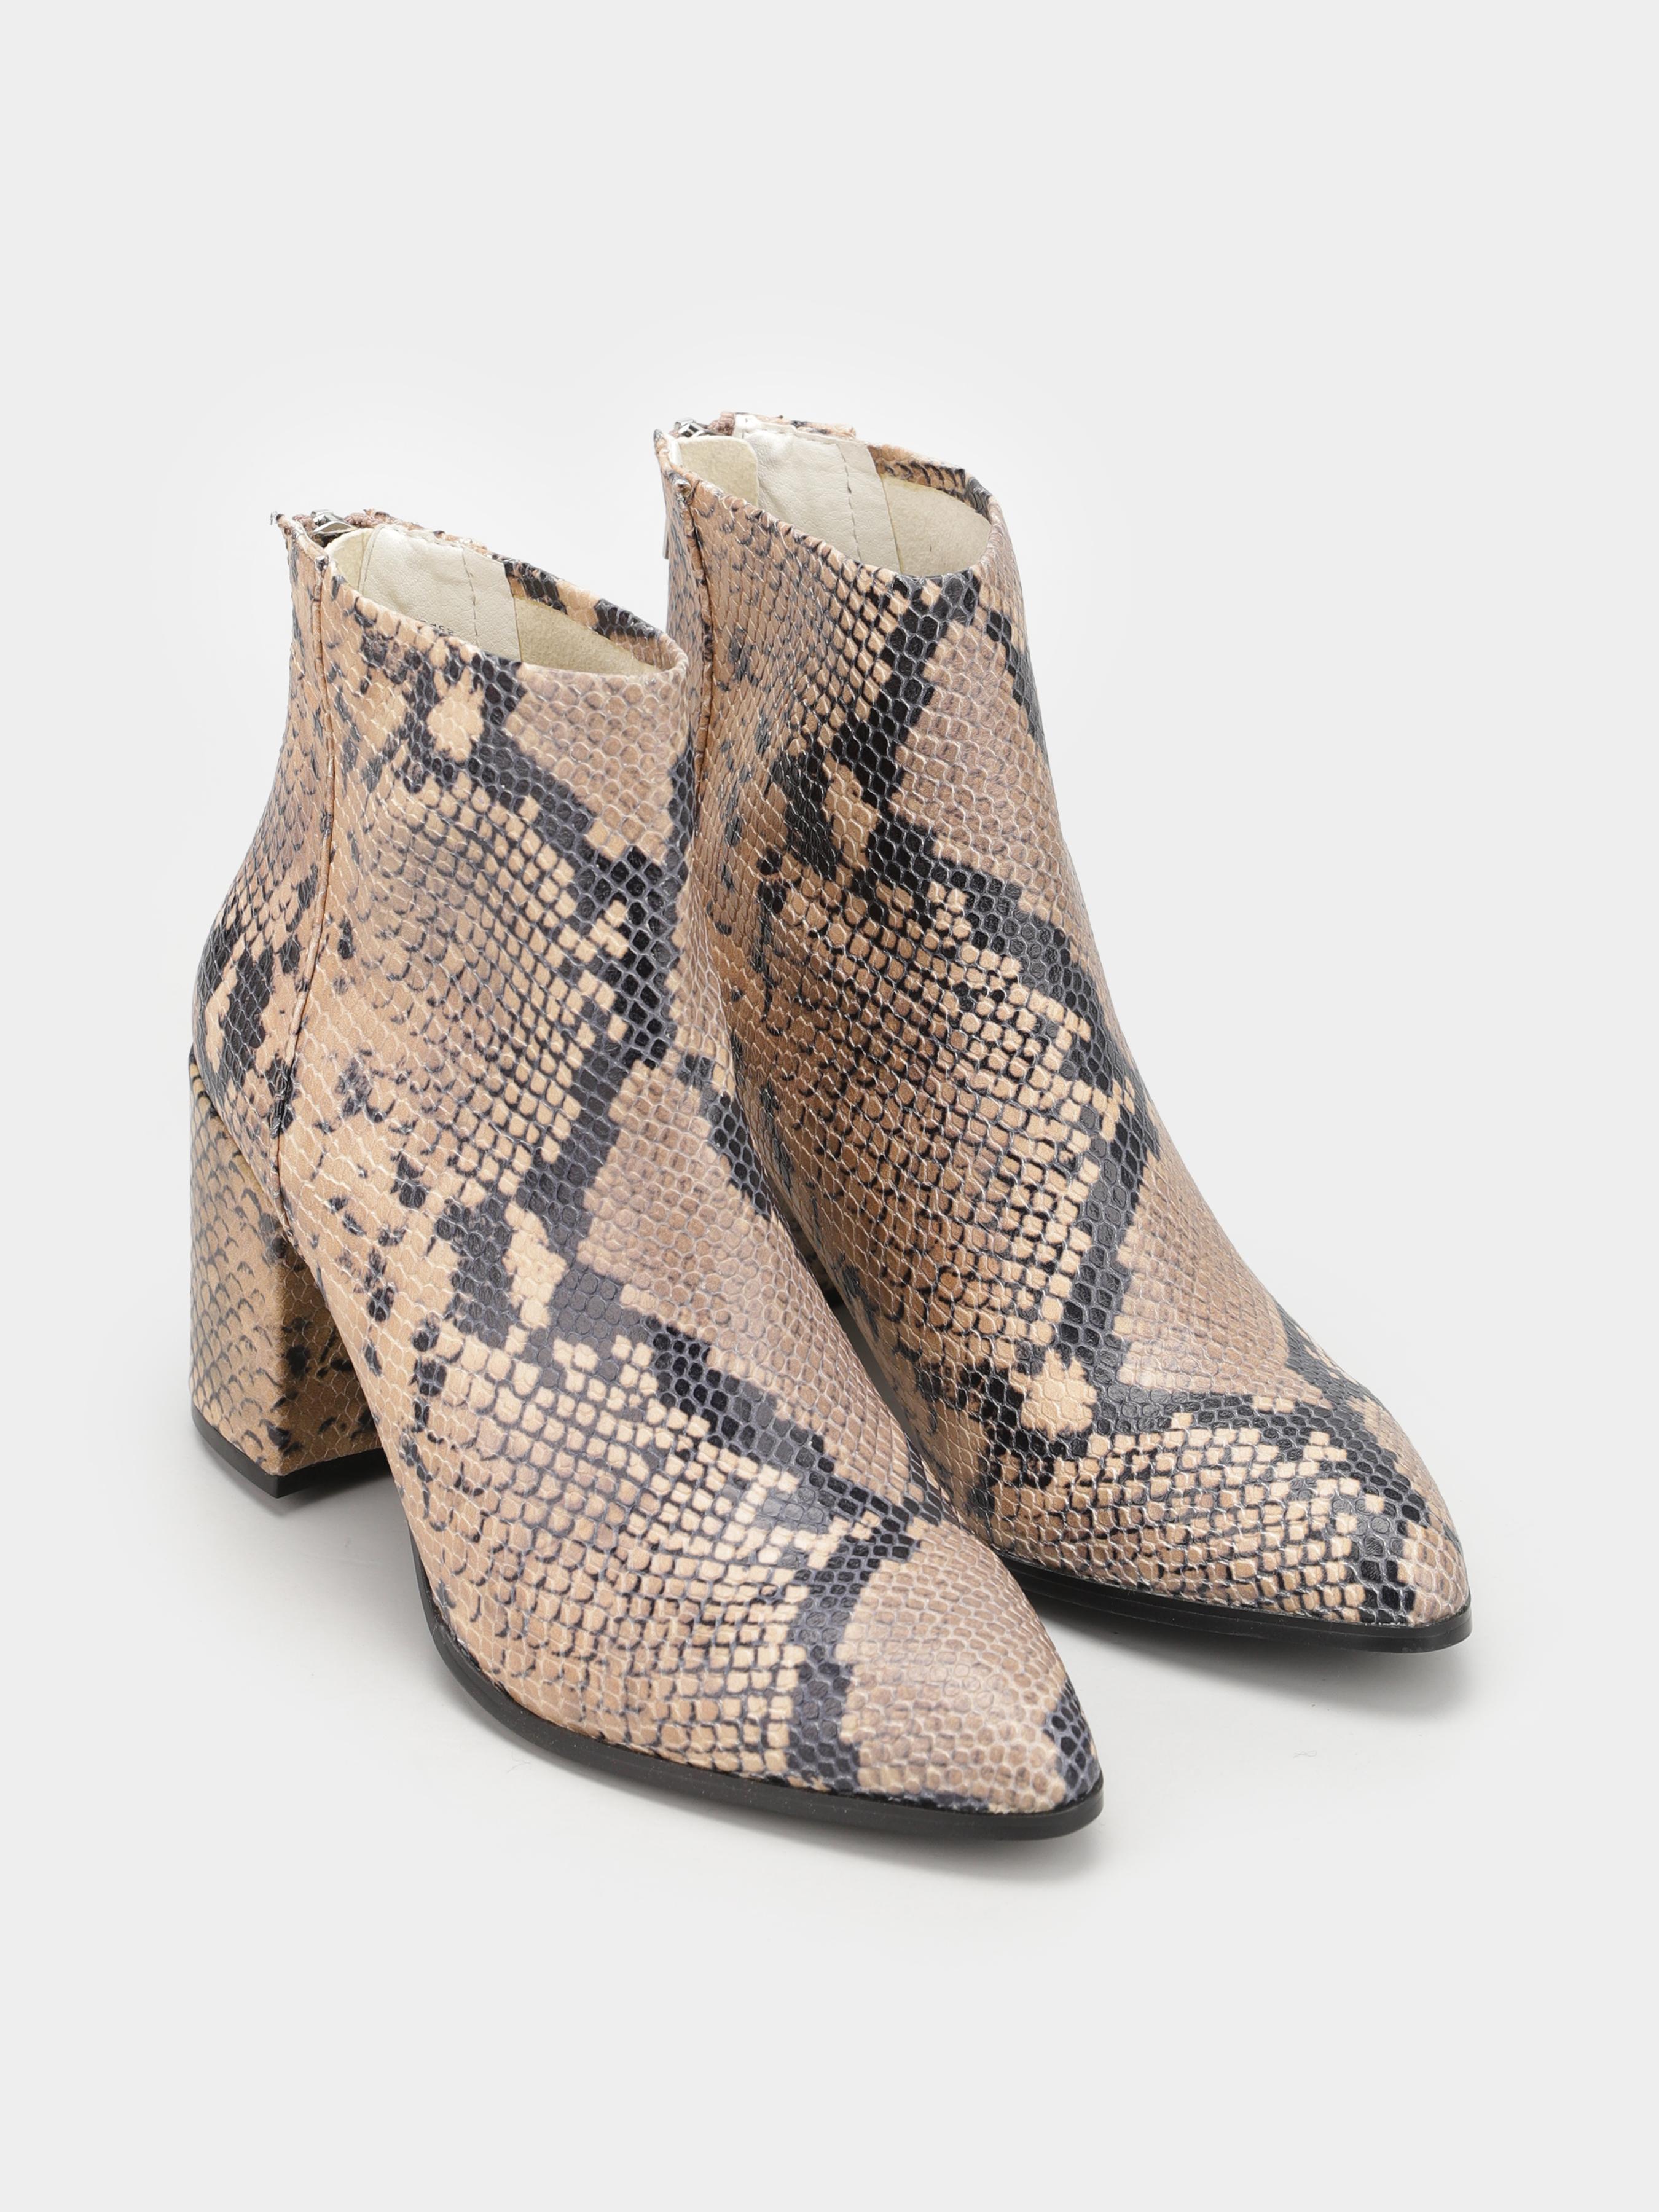 Ботинки женские Steve Madden 9T106 размеры обуви, 2017